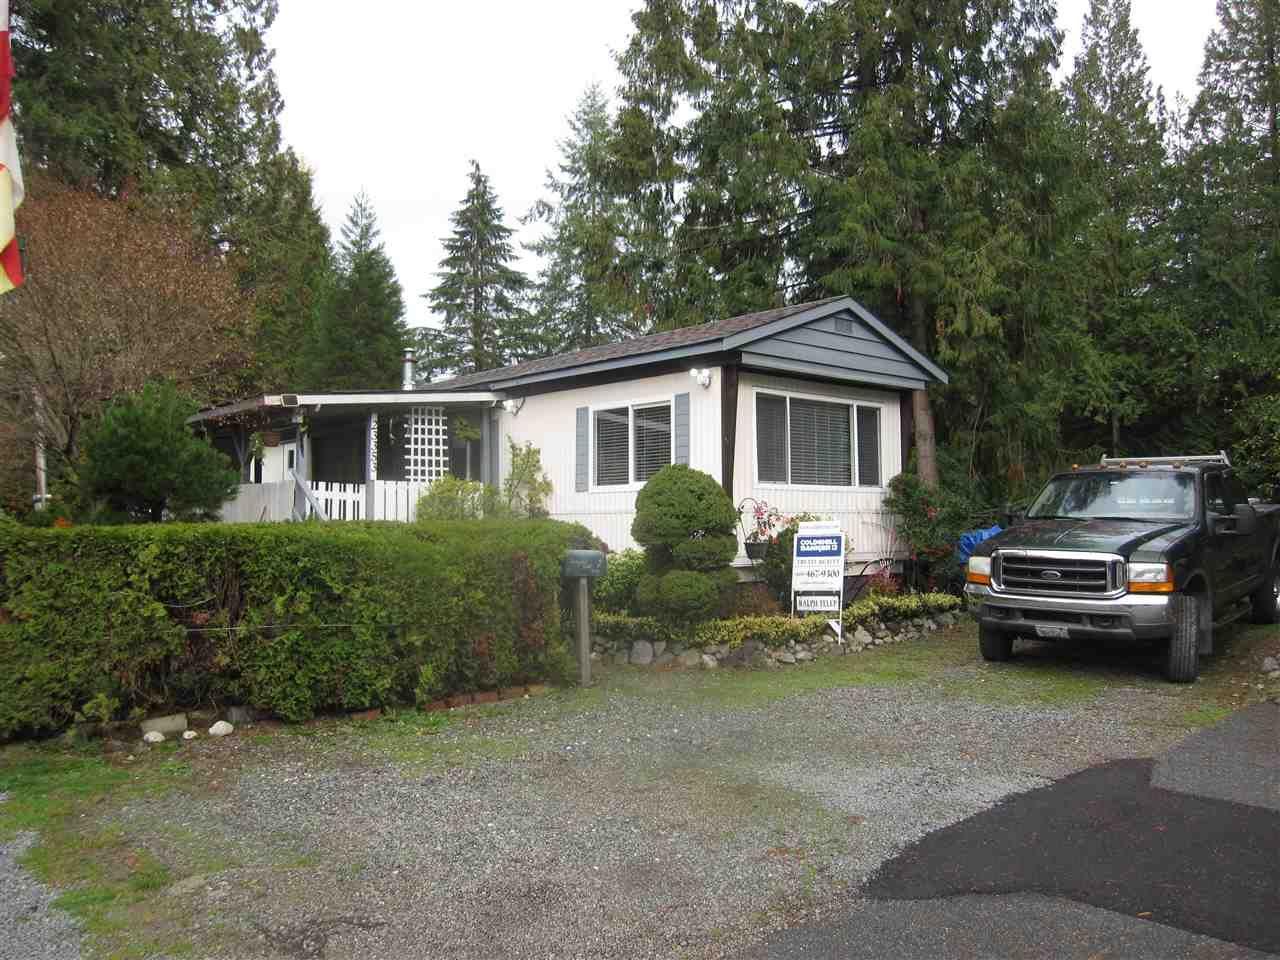 "Main Photo: 23353 CALVIN Crescent in Maple Ridge: Silver Valley Manufactured Home for sale in ""GARIBALDI VILLAGE"" : MLS®# R2320406"